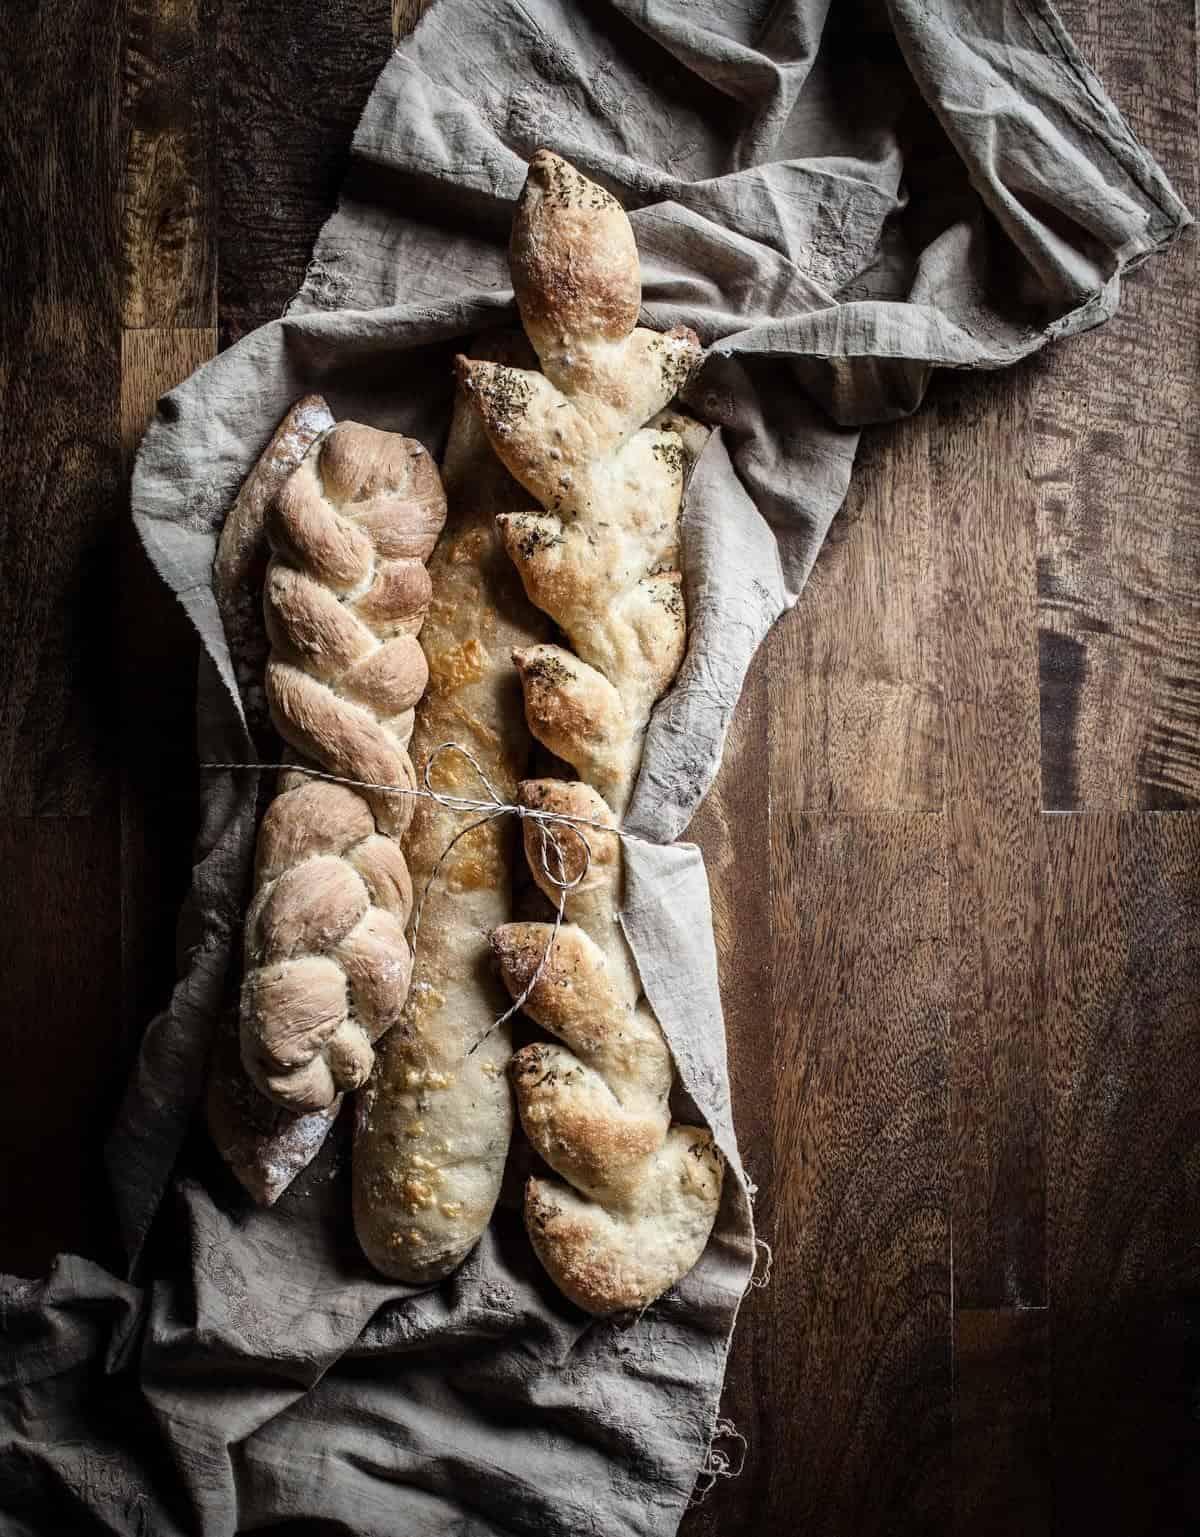 Artisan Baguettes - Little Rusted Ladle - Jena Carlin Photography - King Arthur Flour Limited Usage